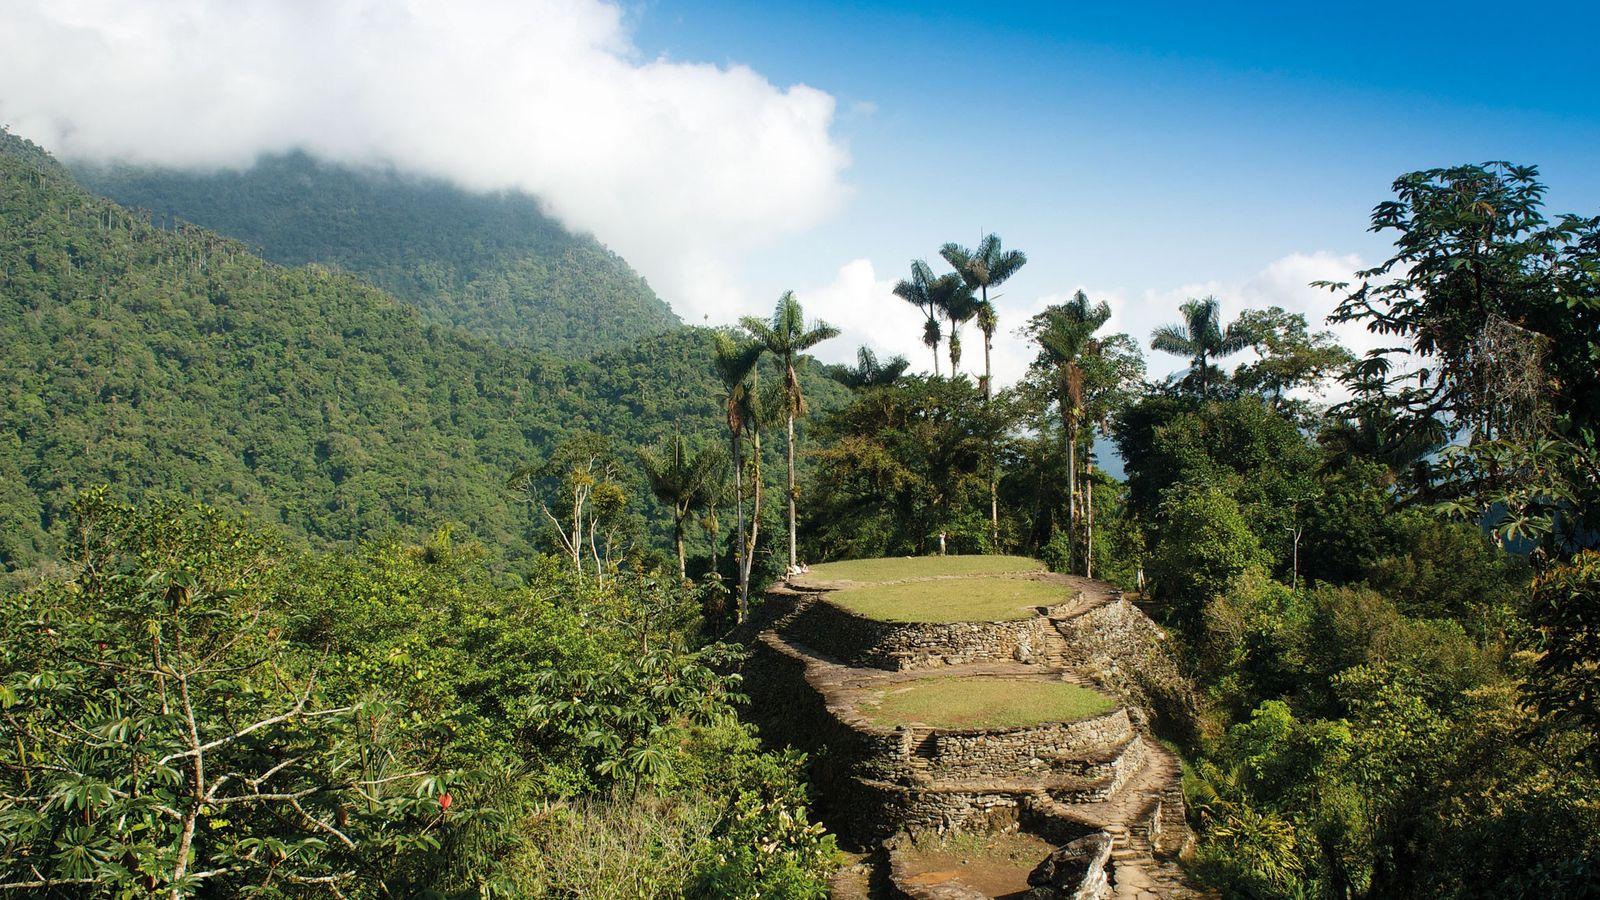 The central terrace of Teyuna in the jungle of the Sierra Nevada de Santa Marta, Colombia, ...